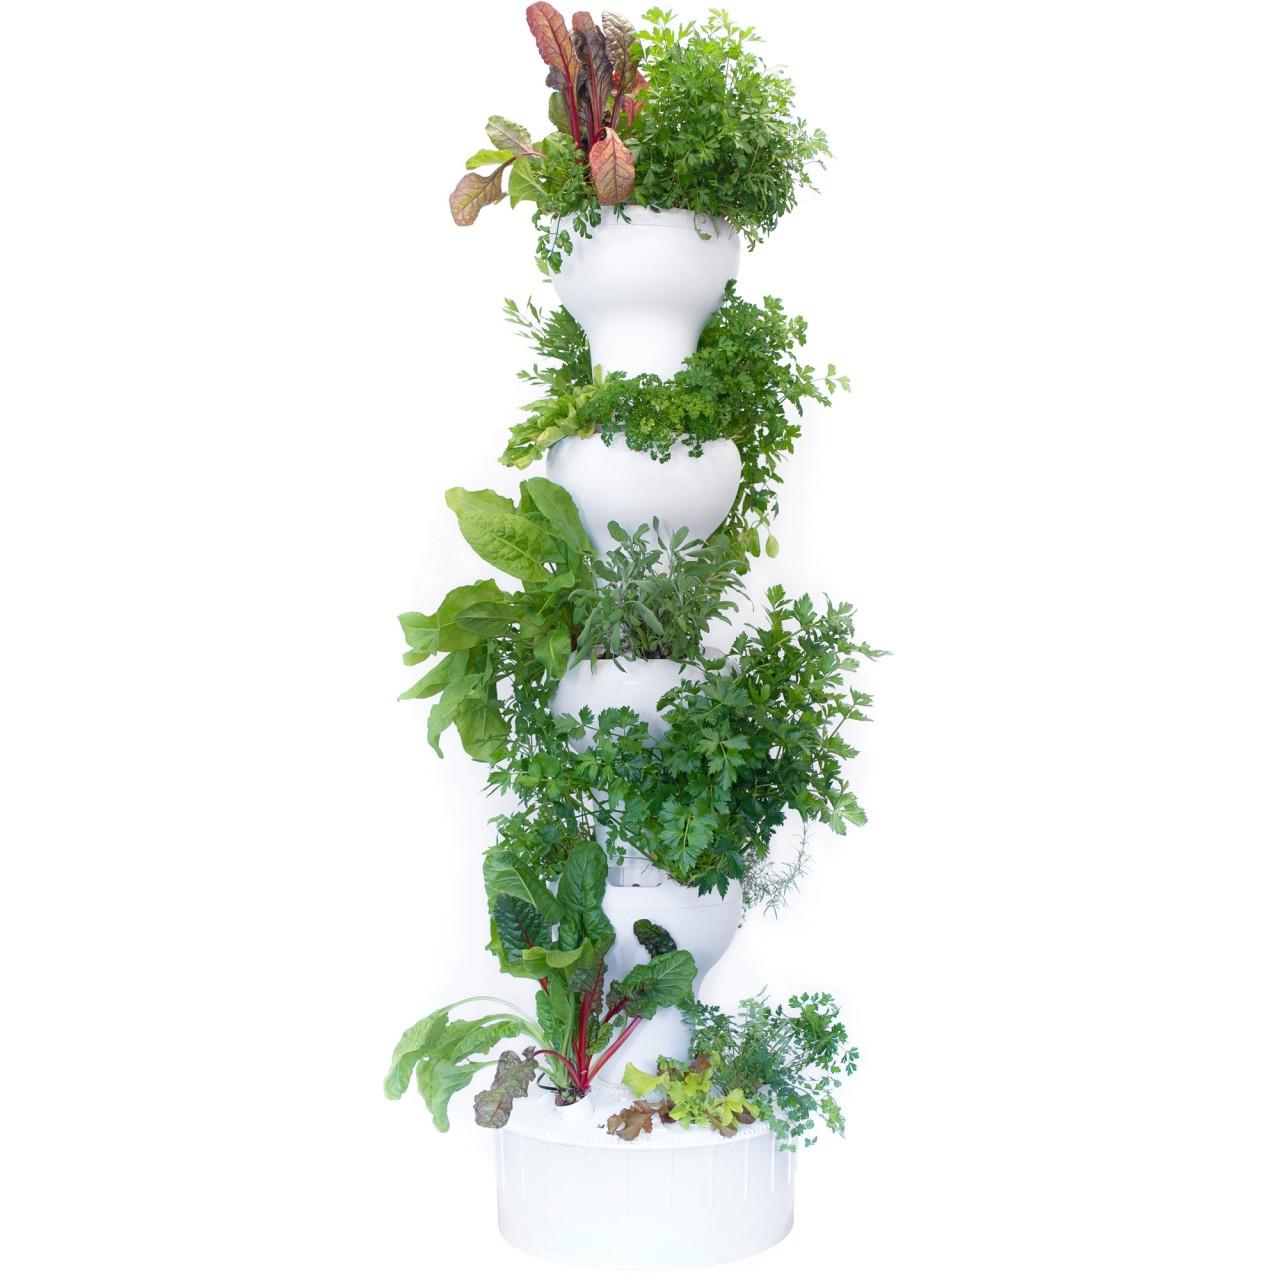 Pflanzsäule 40 Hydrokultur bepflanzt